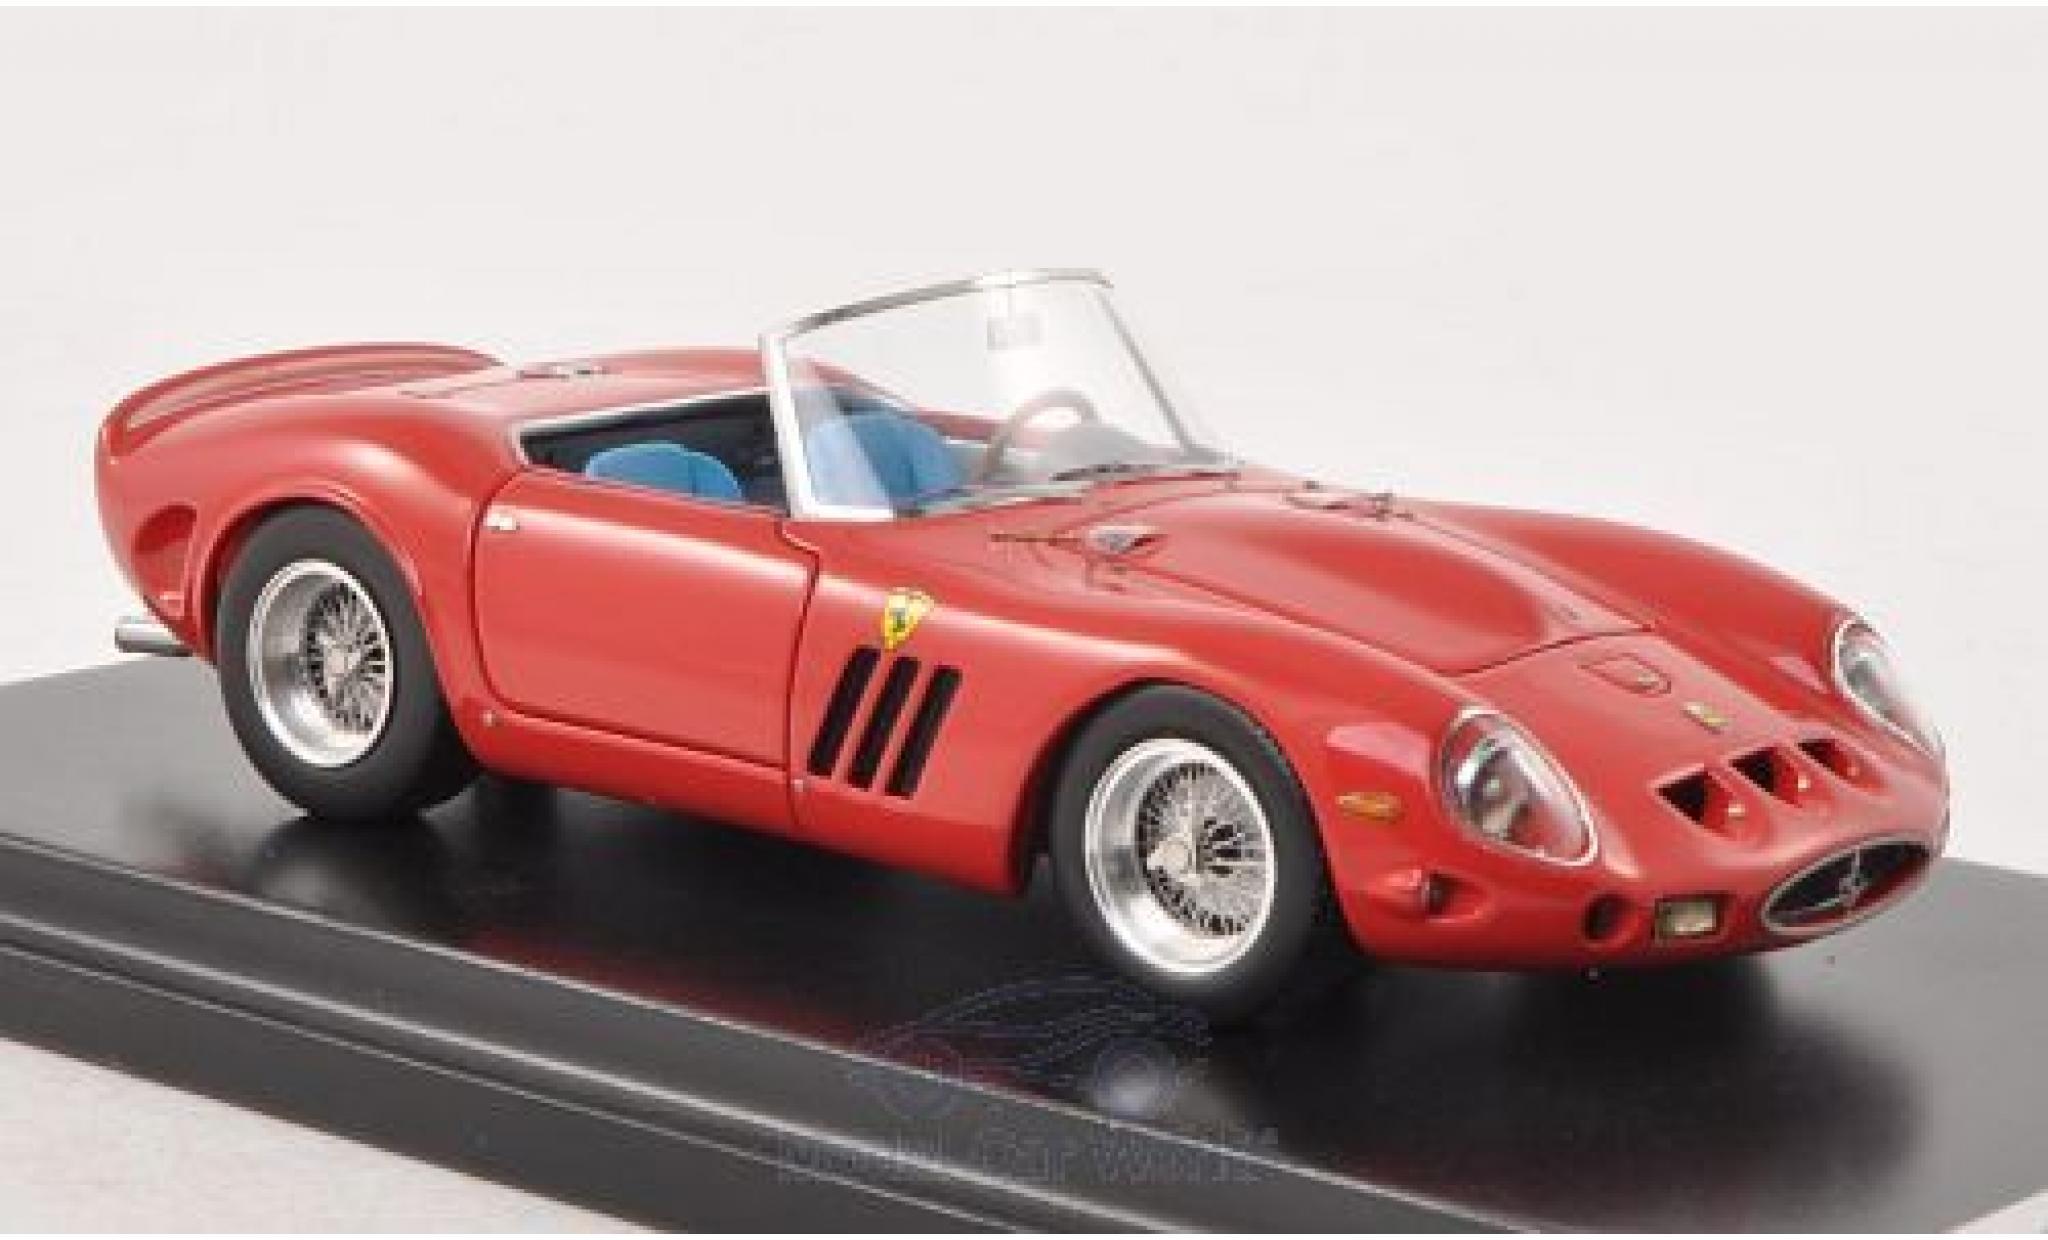 Ferrari 250 Spyder 1/43 Ilario GTO Spyder red